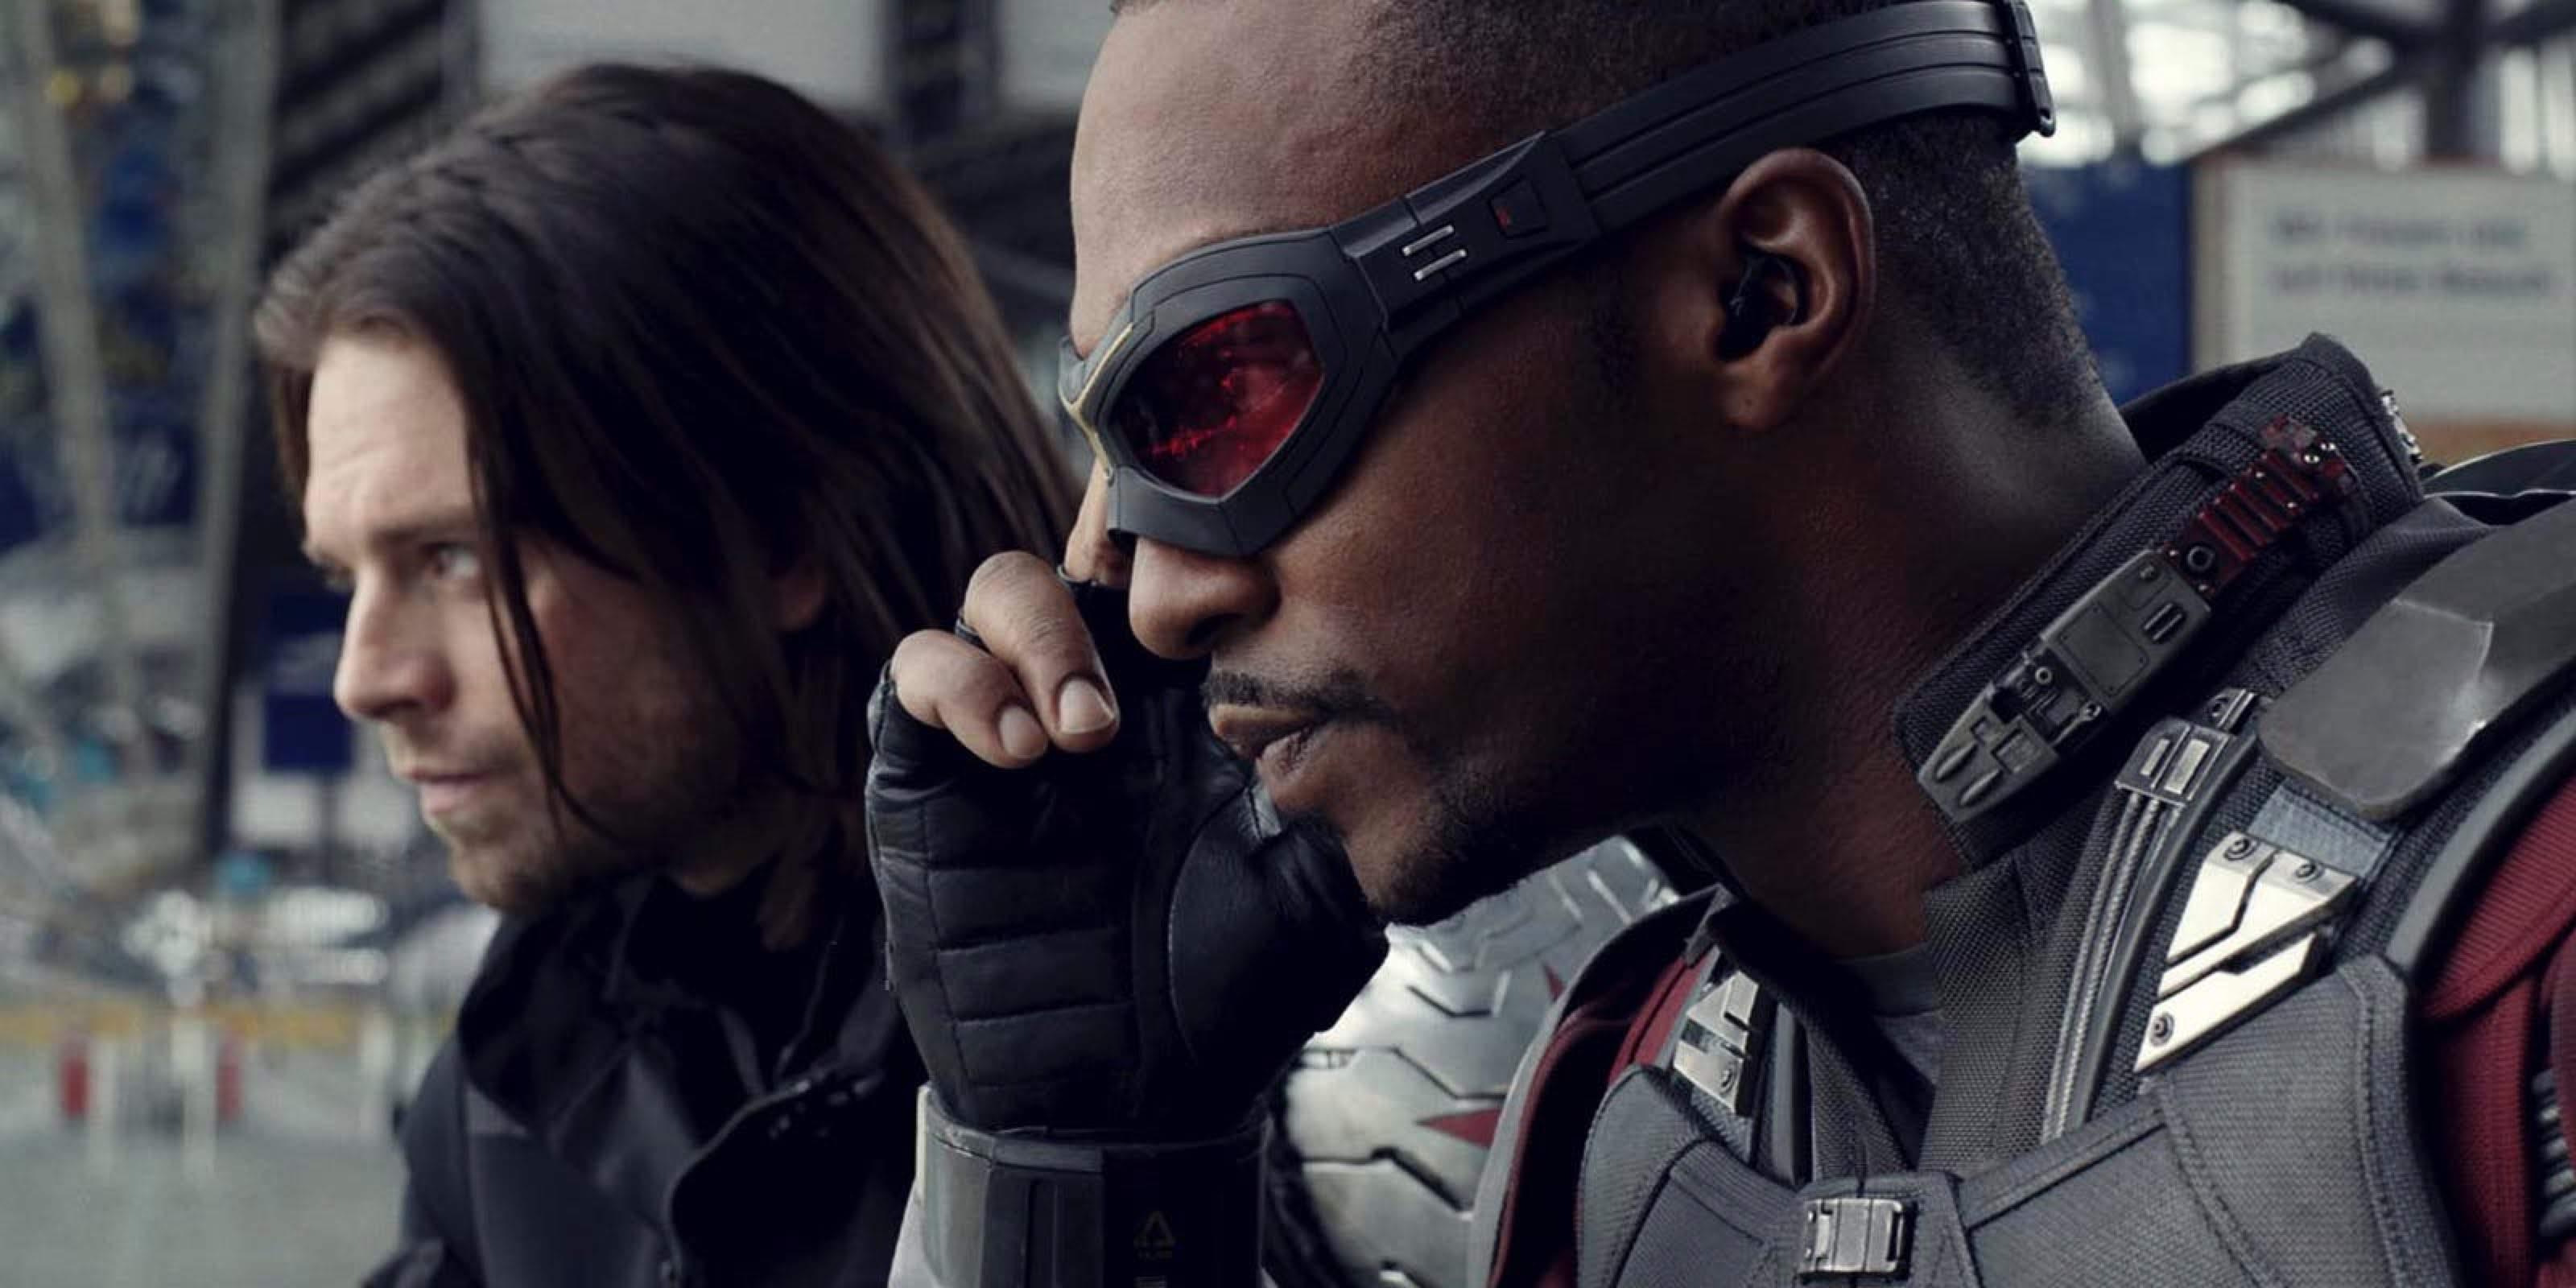 Winter Soldier-Falcon Limited Series for Disney's Streaming : ウィンター・ソルジャーとファルコンが相棒のコンビを組んで活躍するマーベルのヒーロー・ドラマの新企画に、ディズニーの配信サービスが着手 ! !